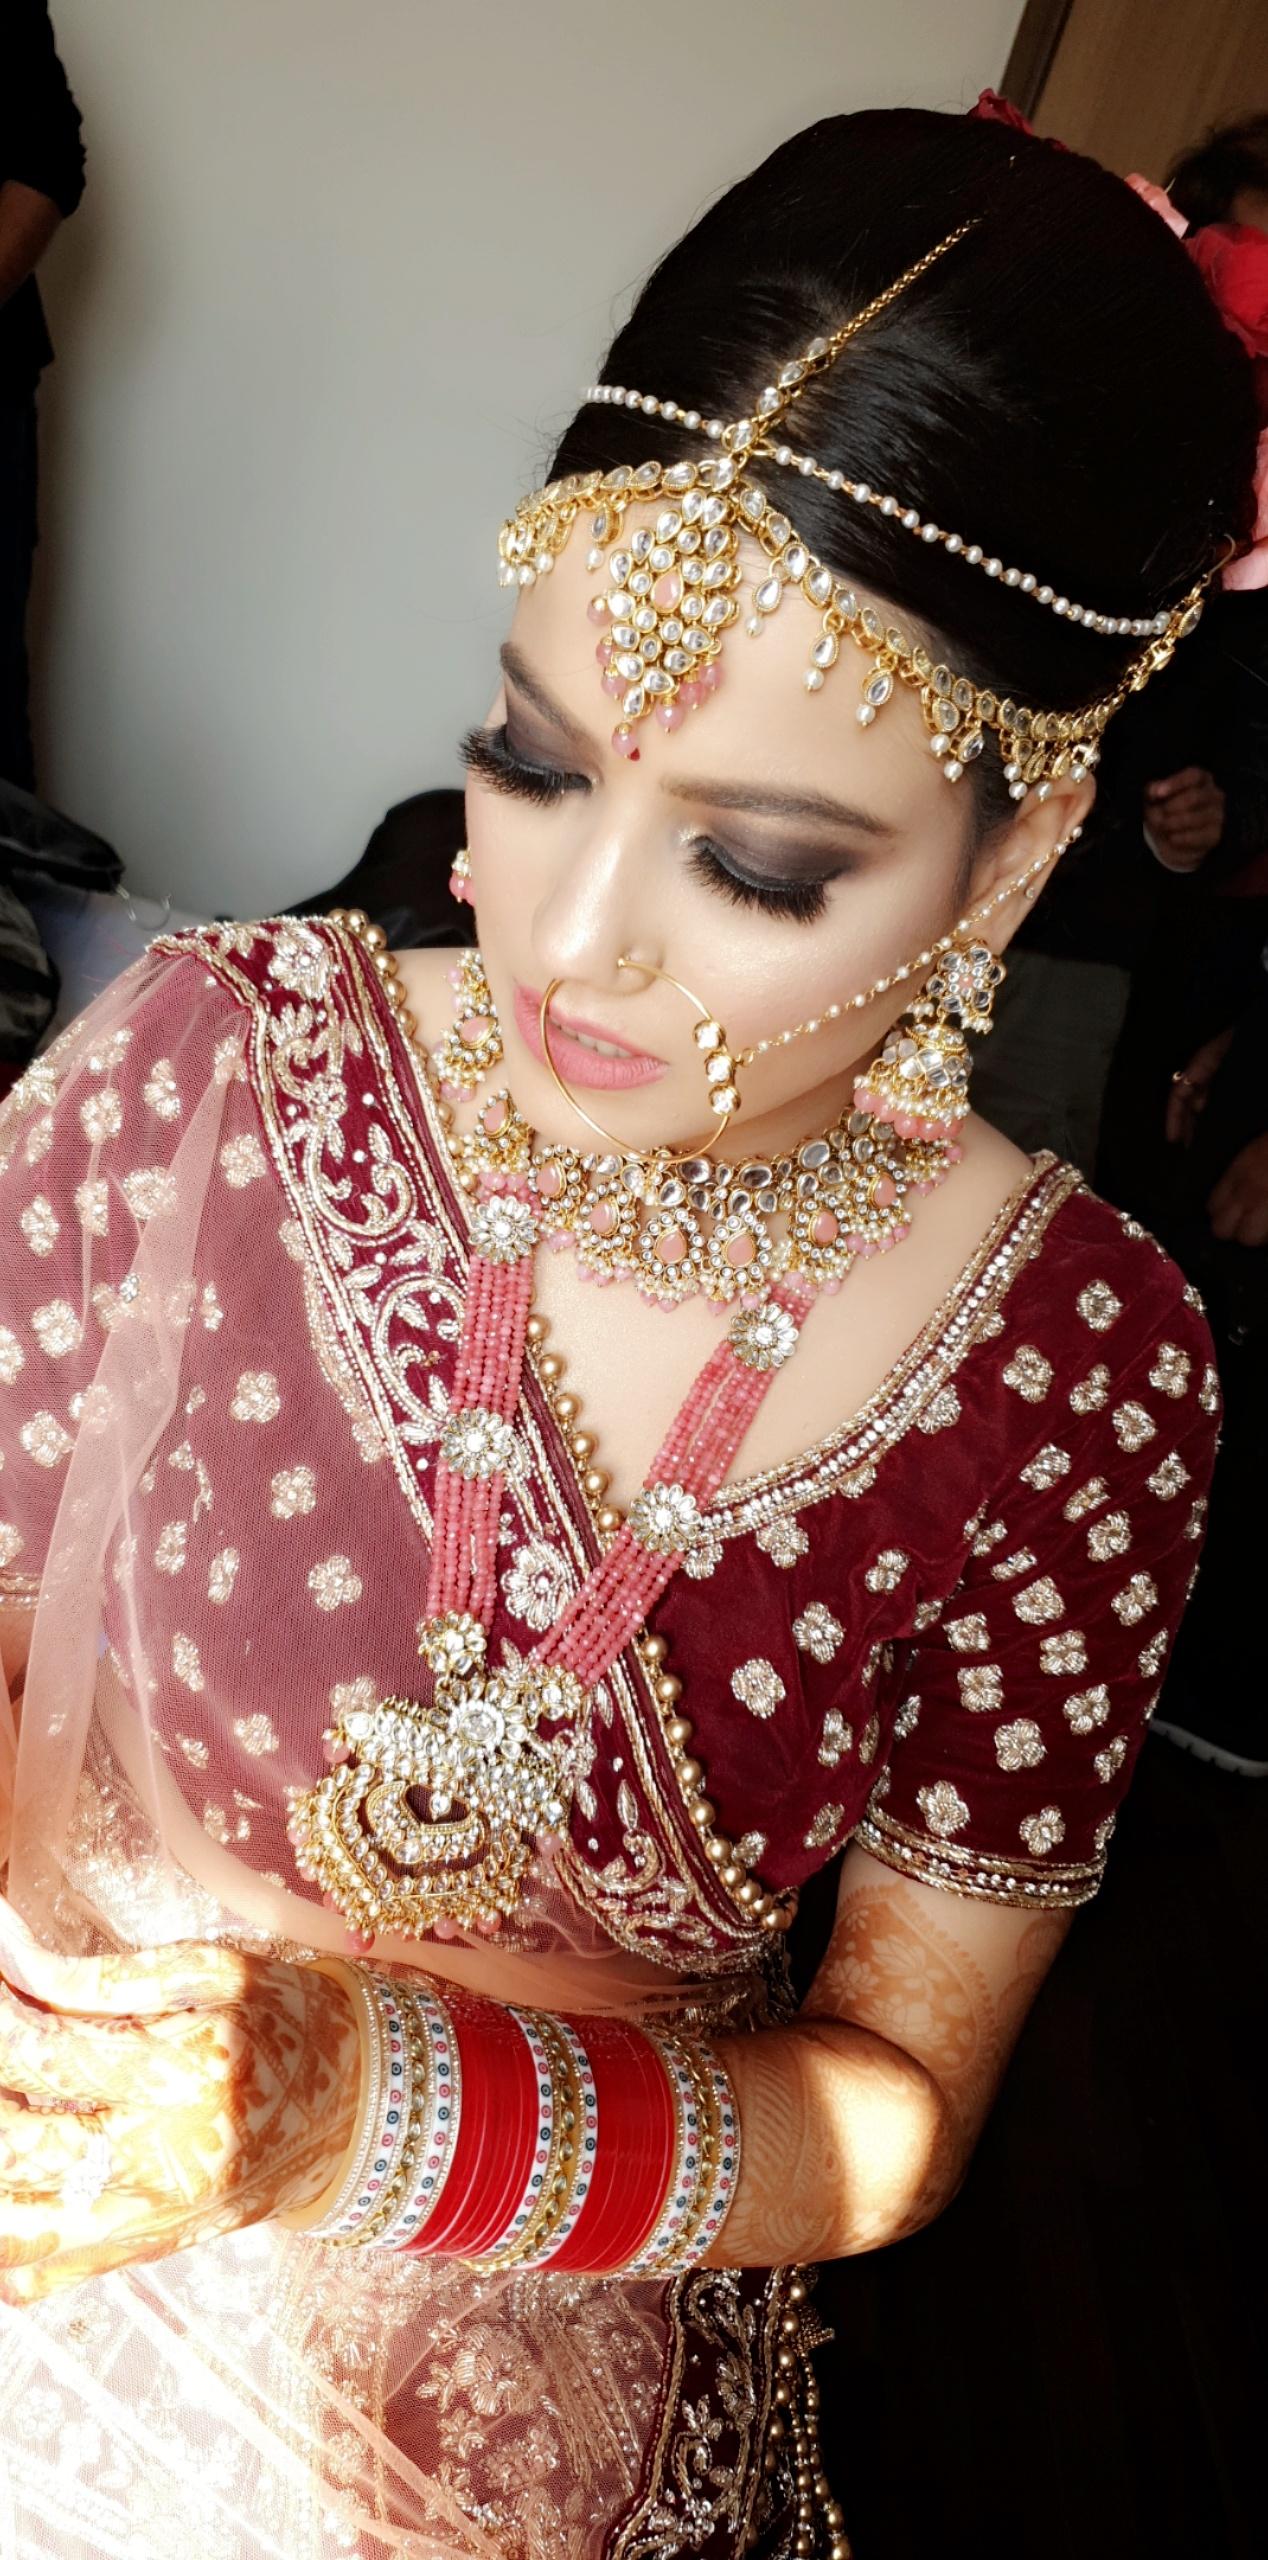 shweta-bhutani-makeup-artist-delhi-ncr